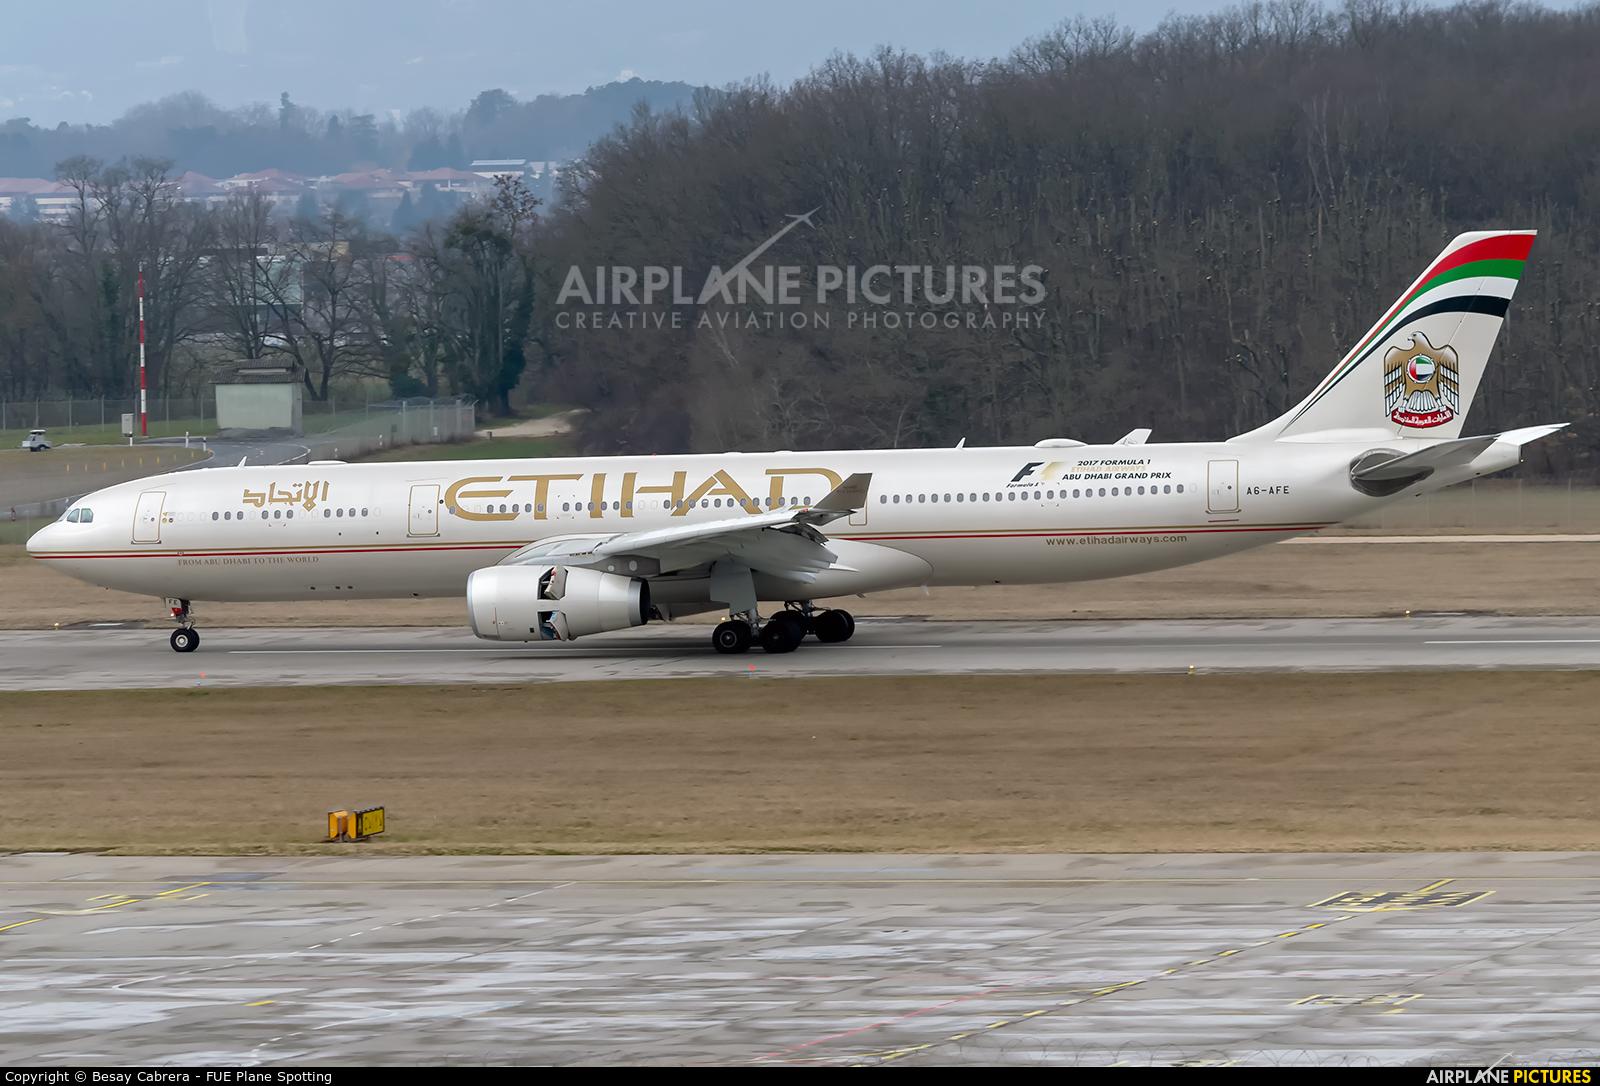 Etihad Airways A6-AFE aircraft at Geneva Intl